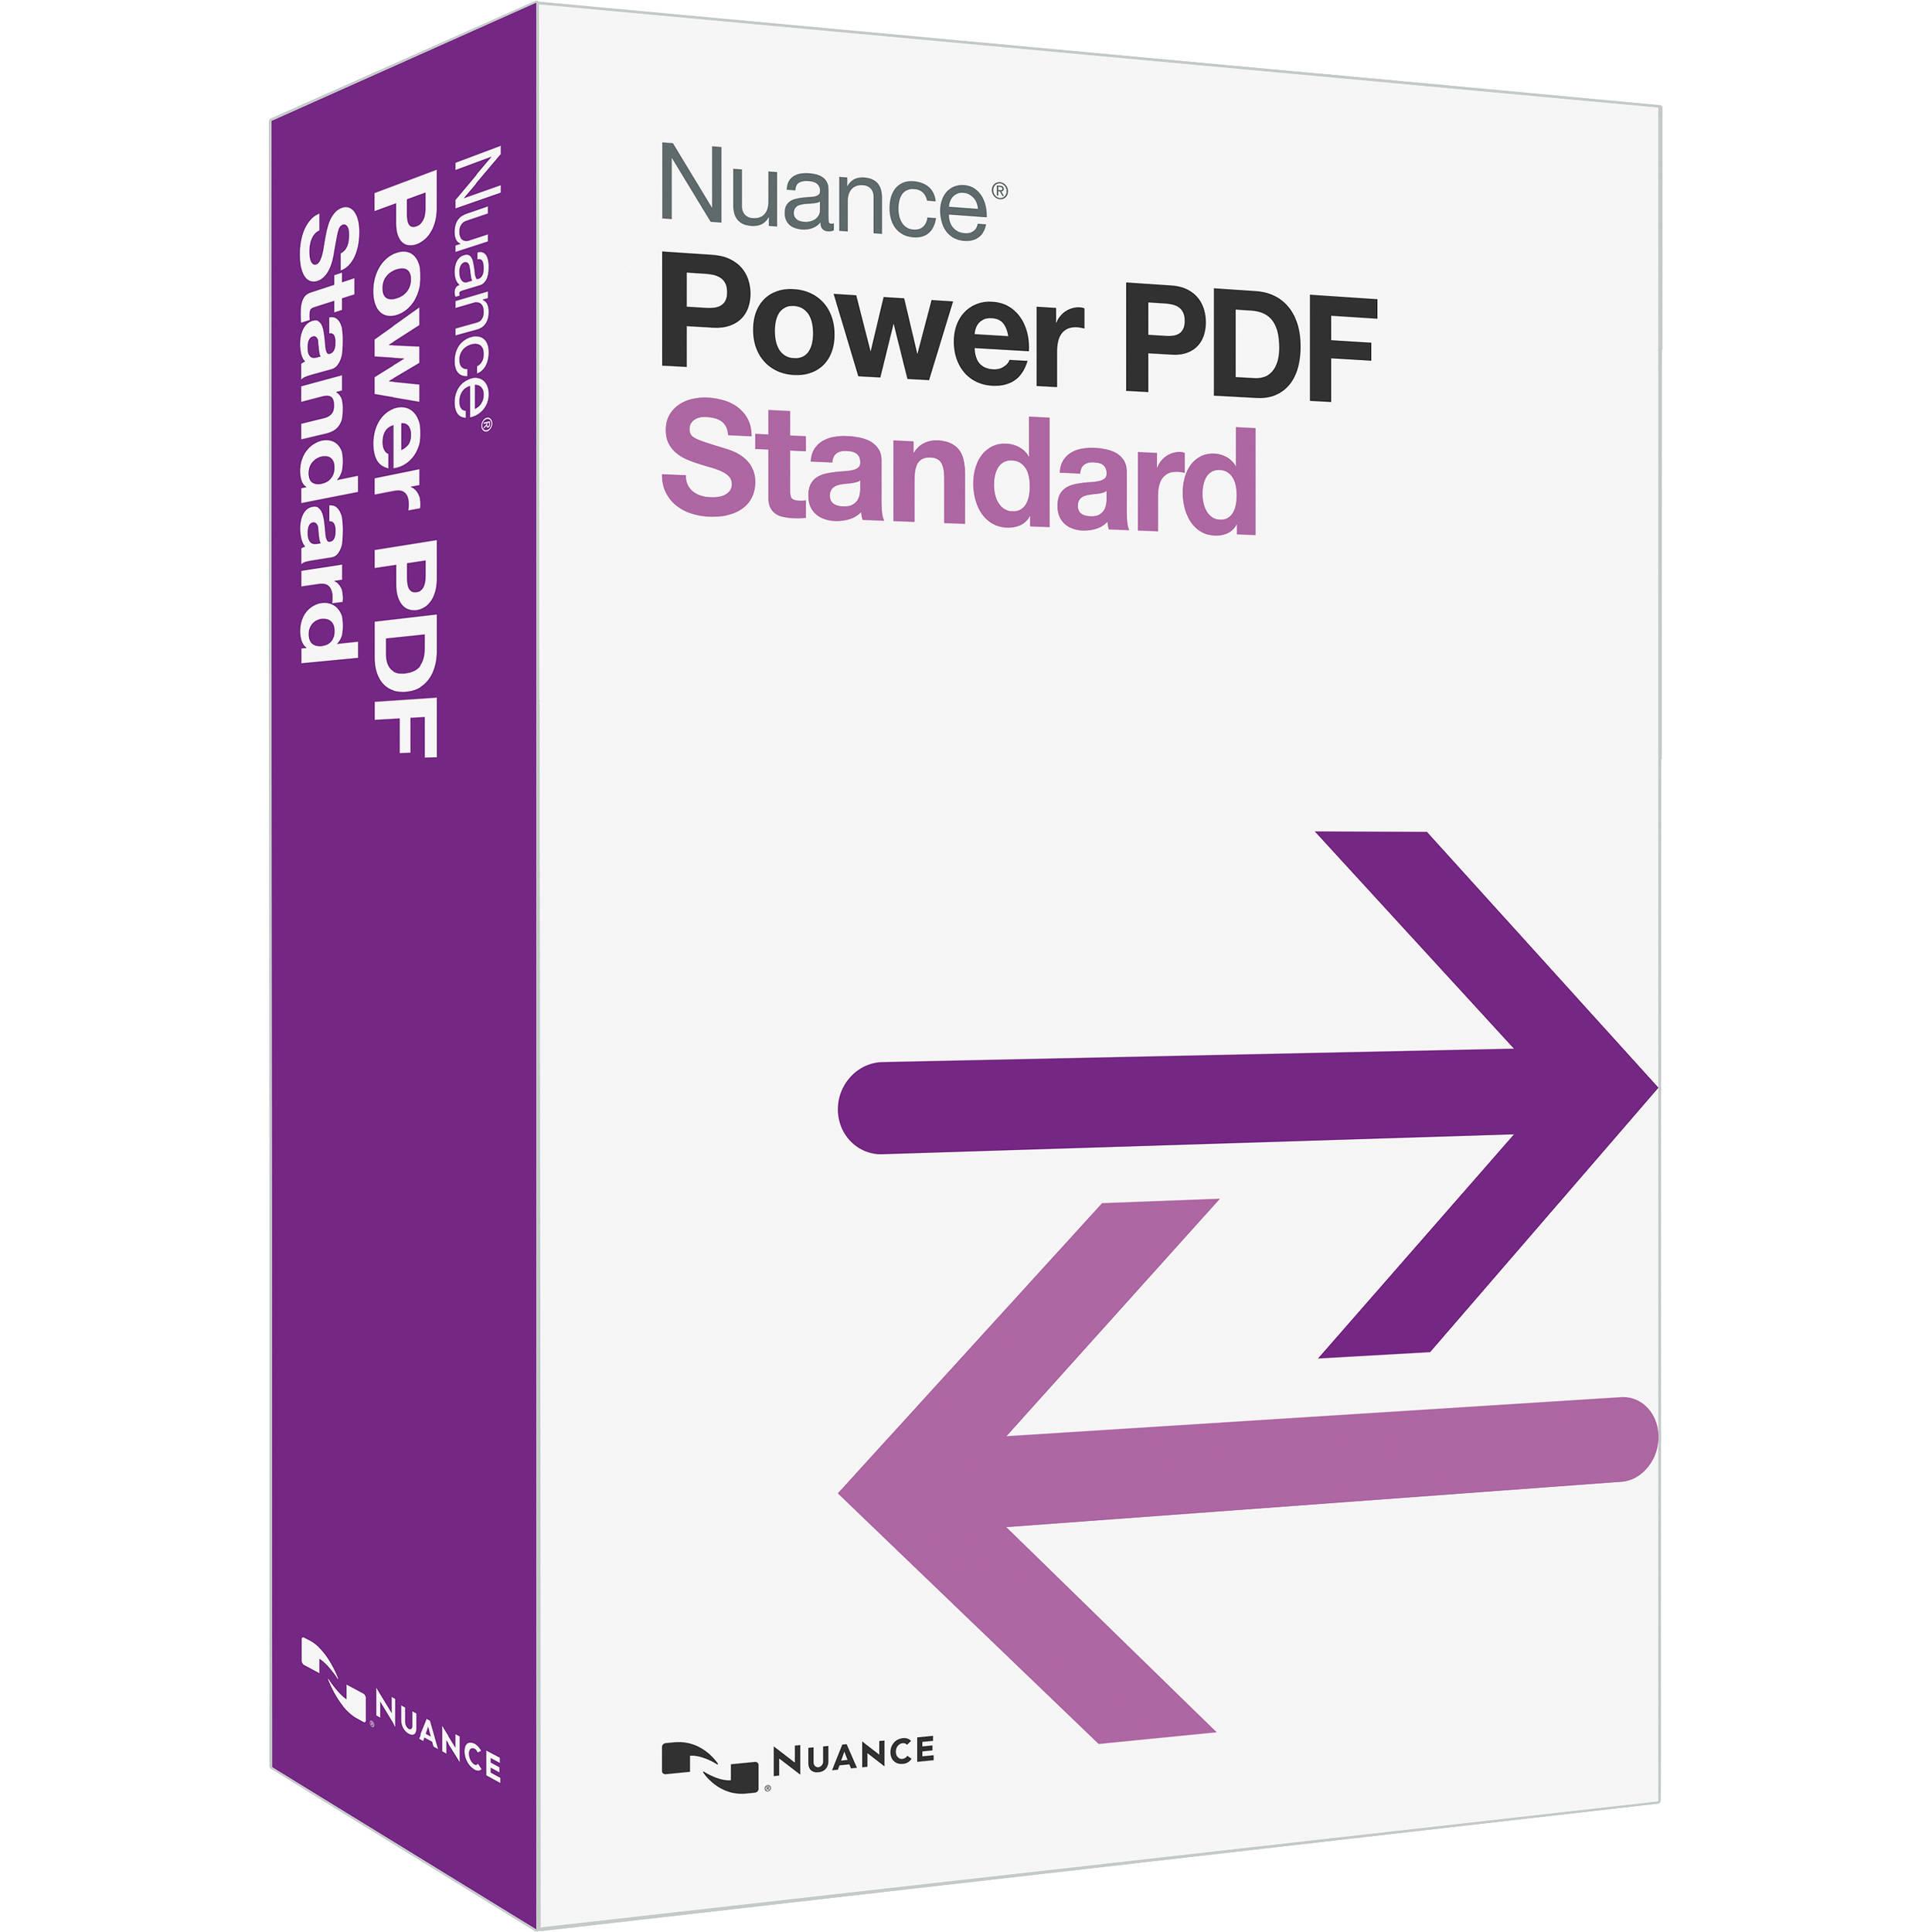 nuance power pdf standard user manual